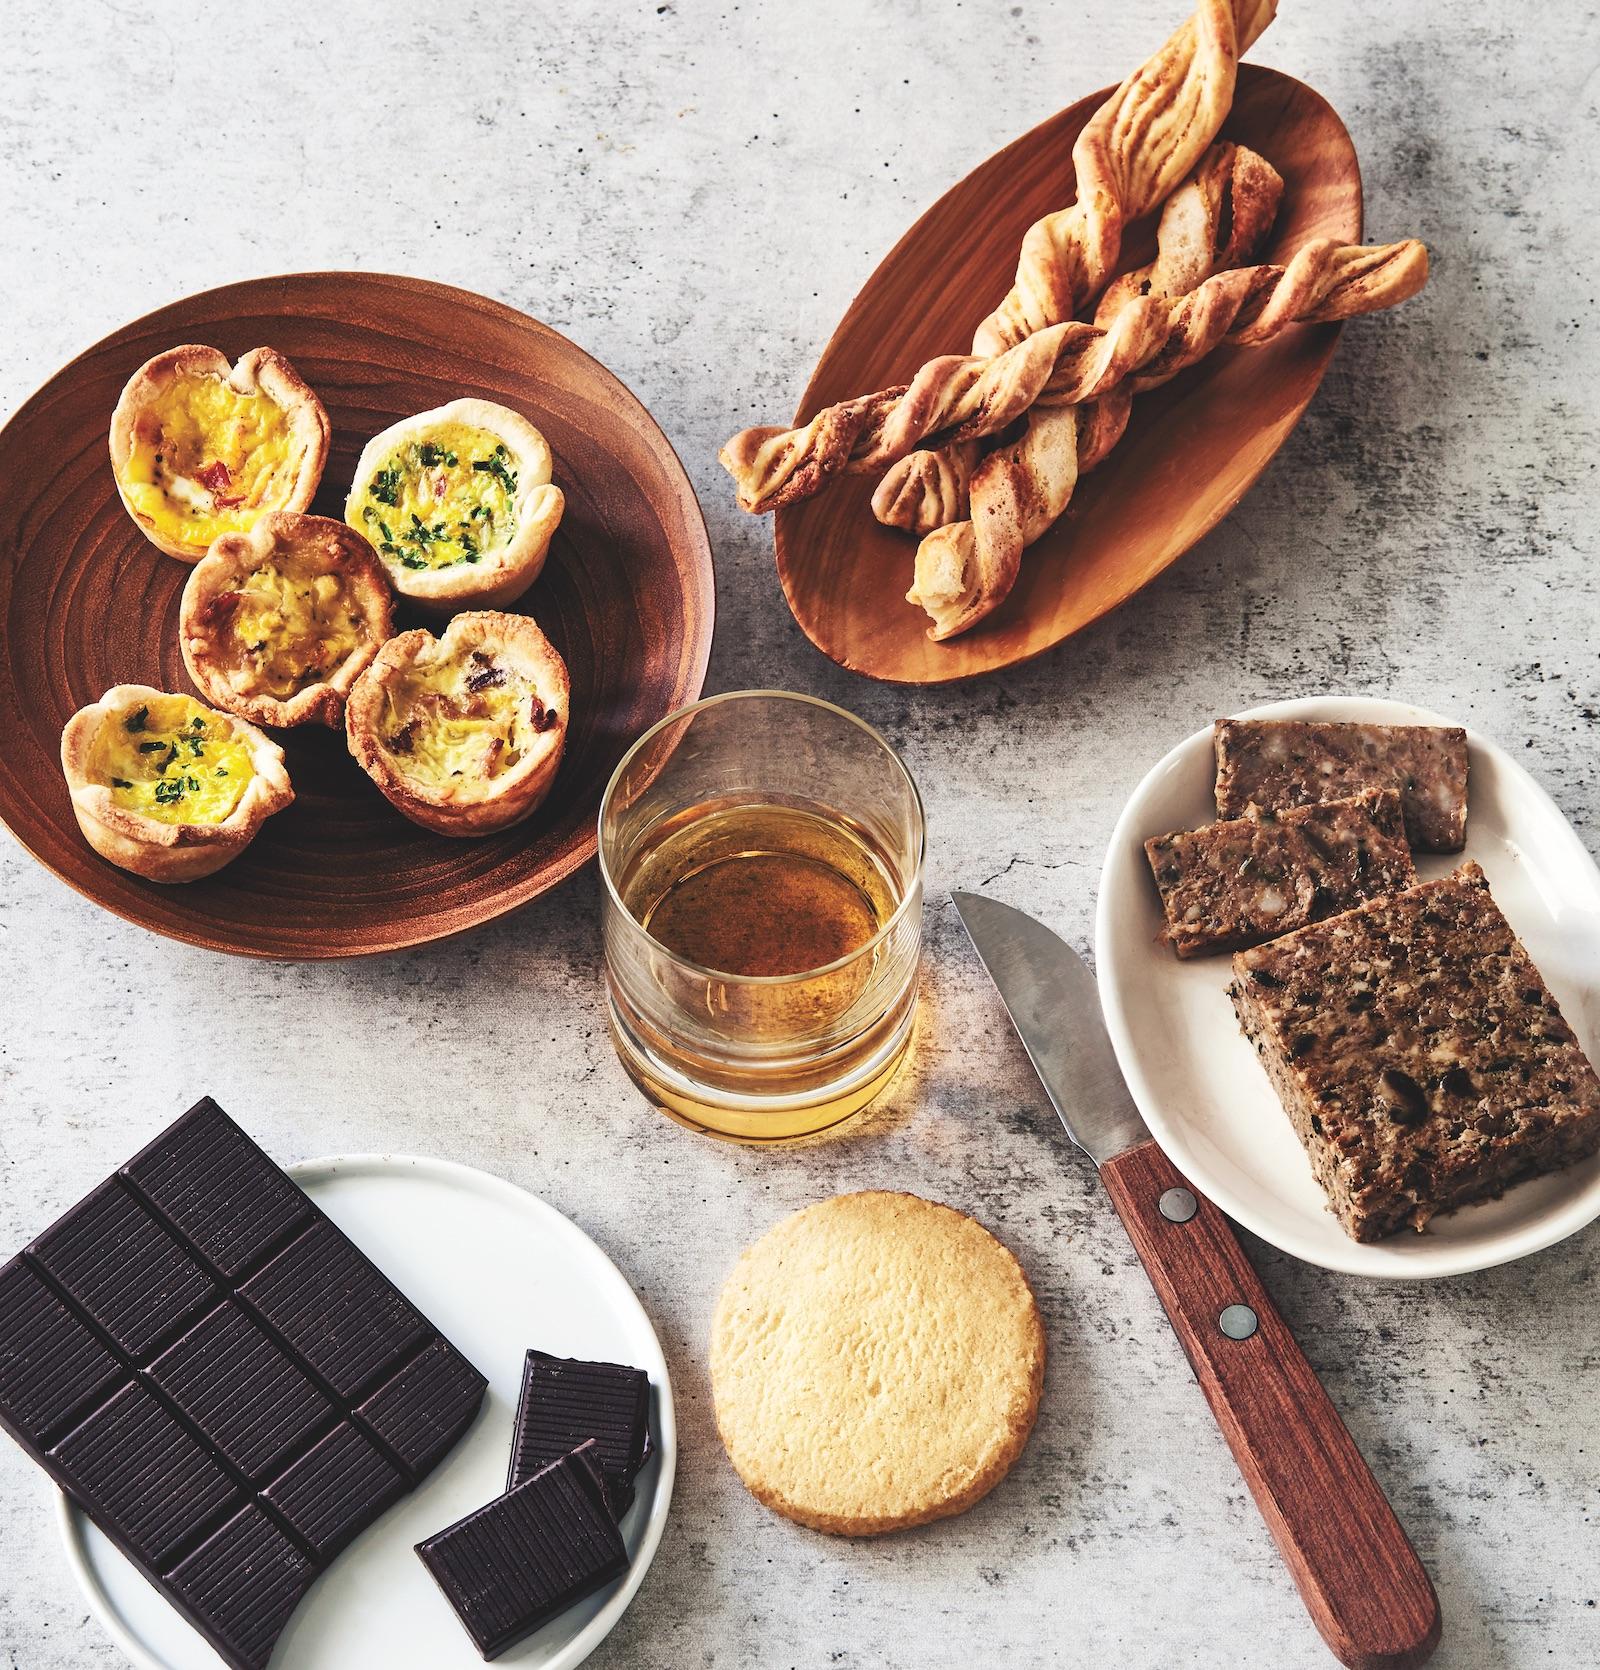 quiche, cheese straws, dark chocolate, paté, and vanilla cookie with a glass of Irish whiskey